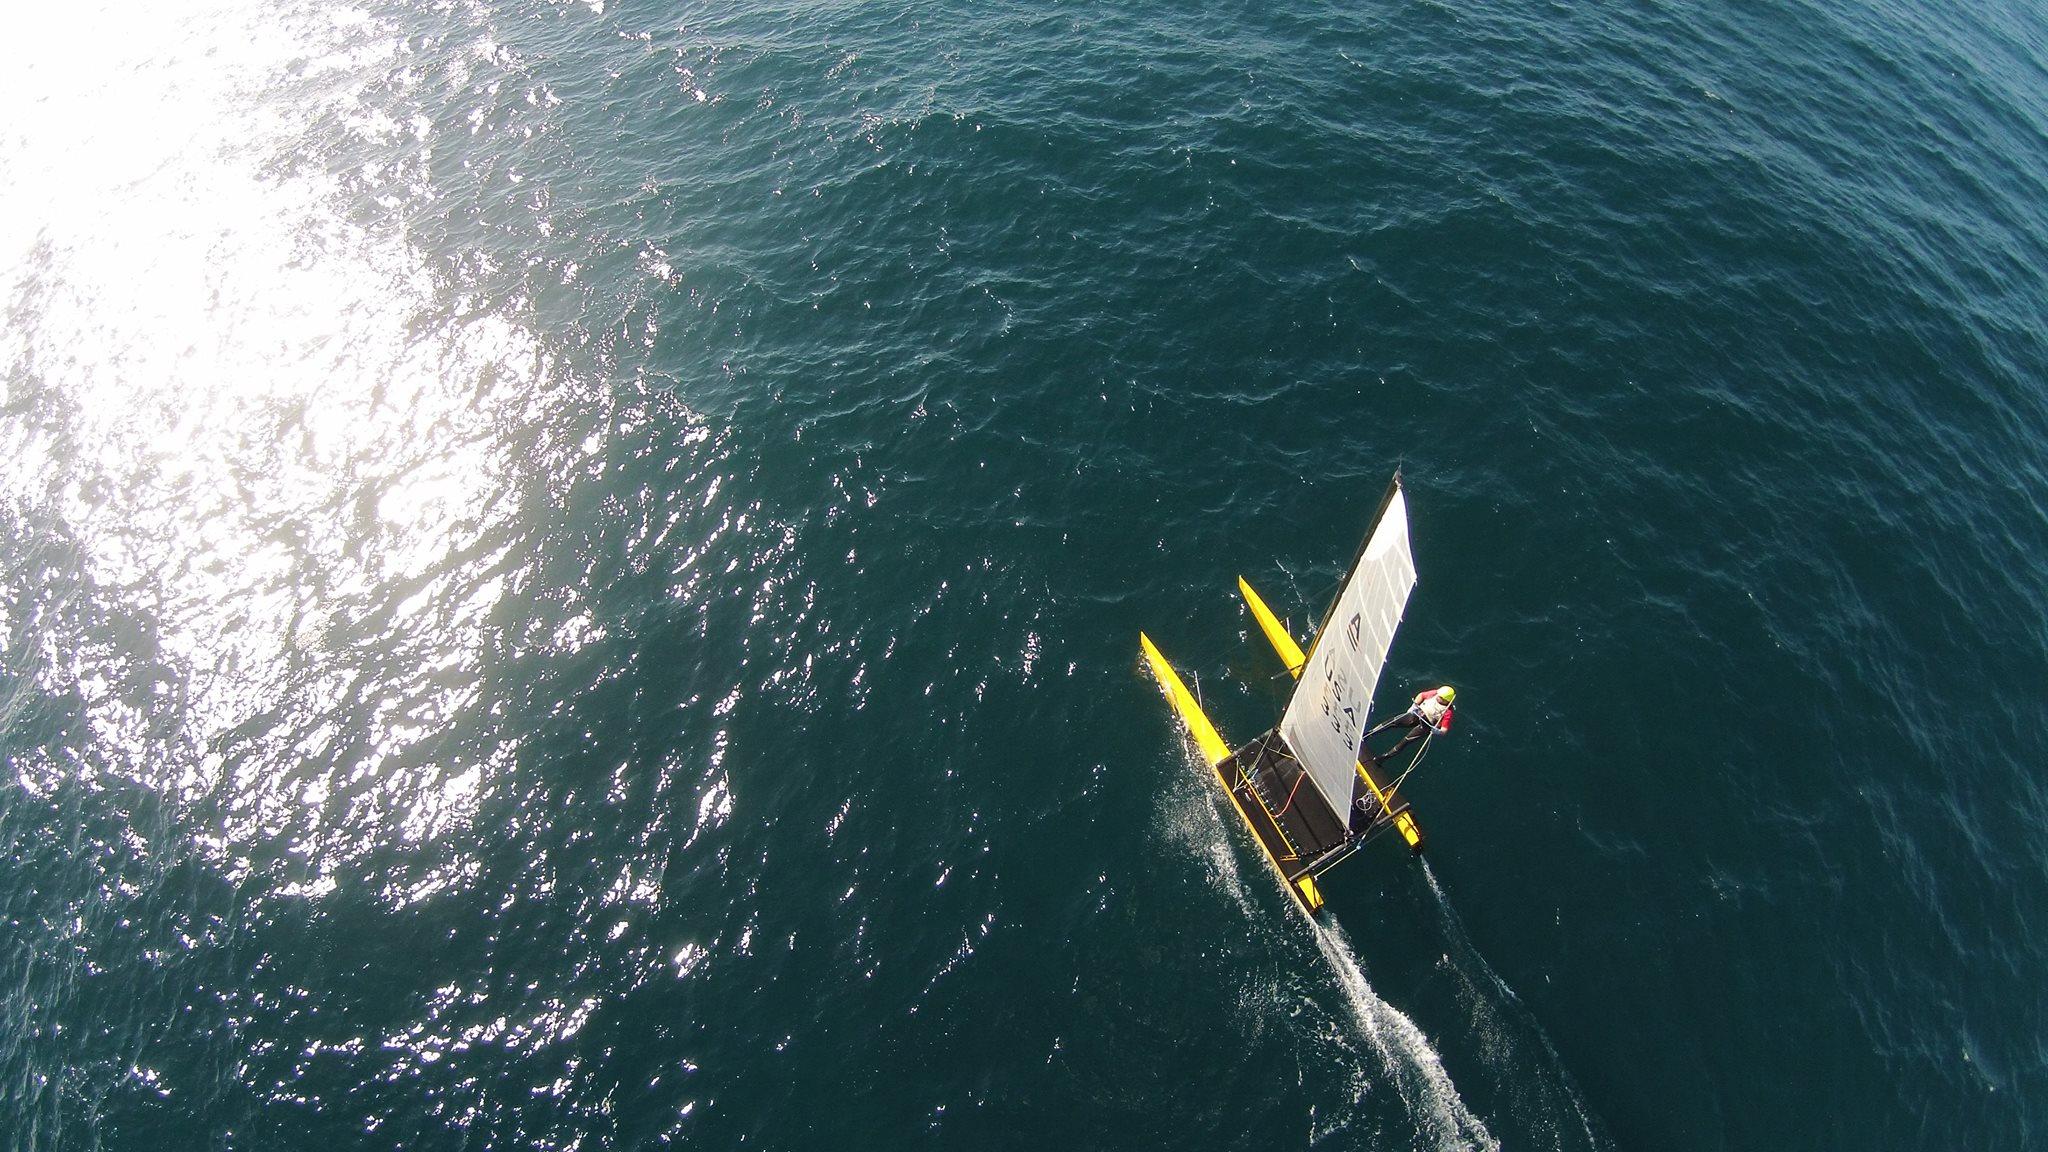 Philippe Kahn - Pegasus Racing - Santa Cruz High Performance A Cat Sailing